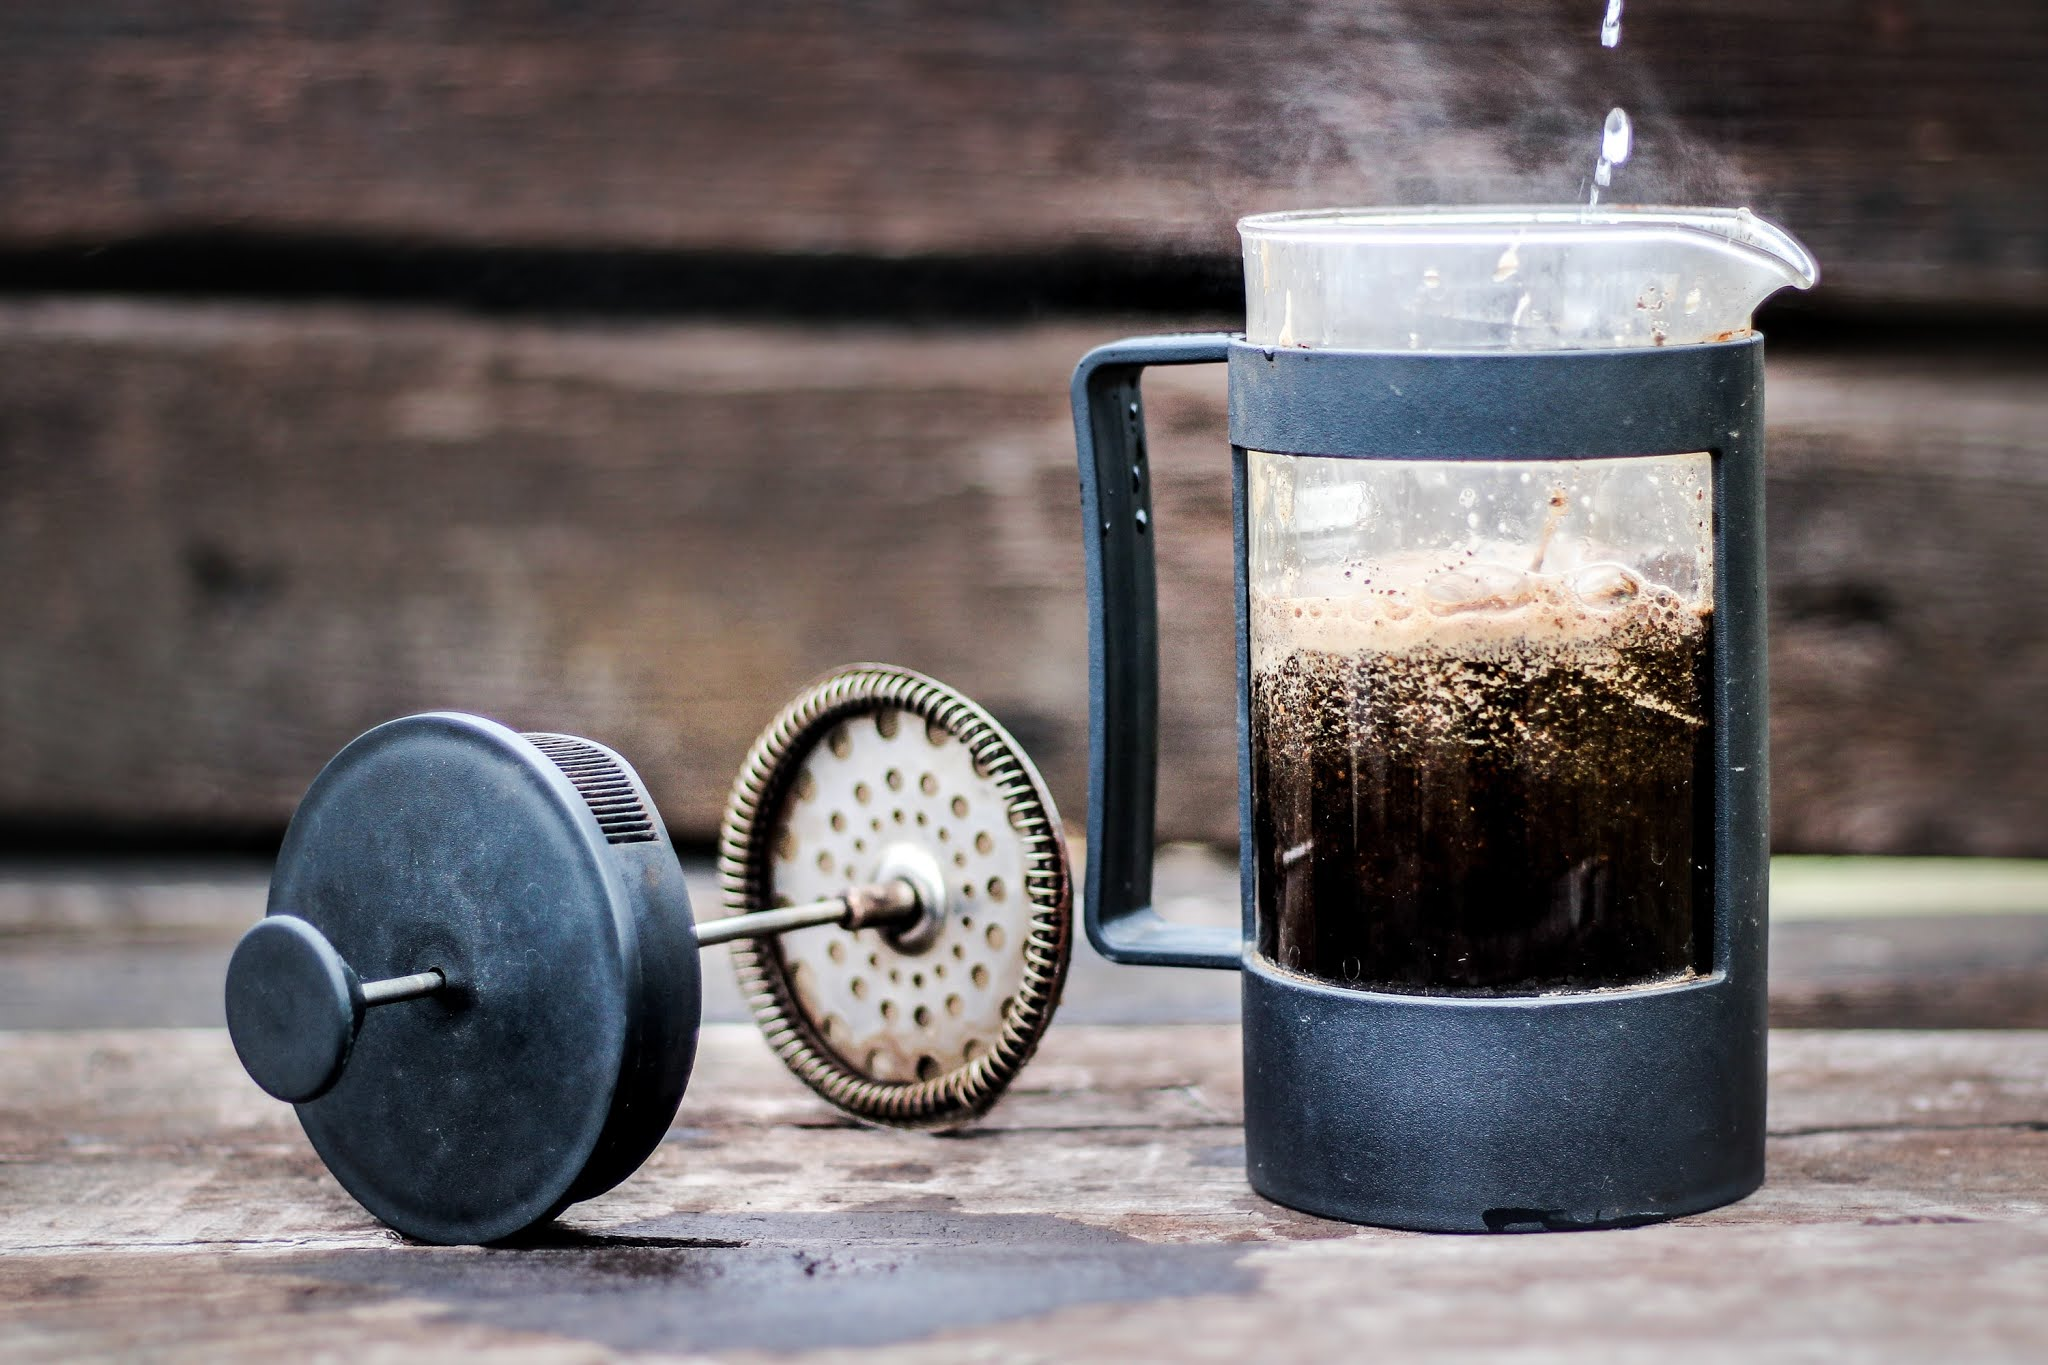 French-press coffee